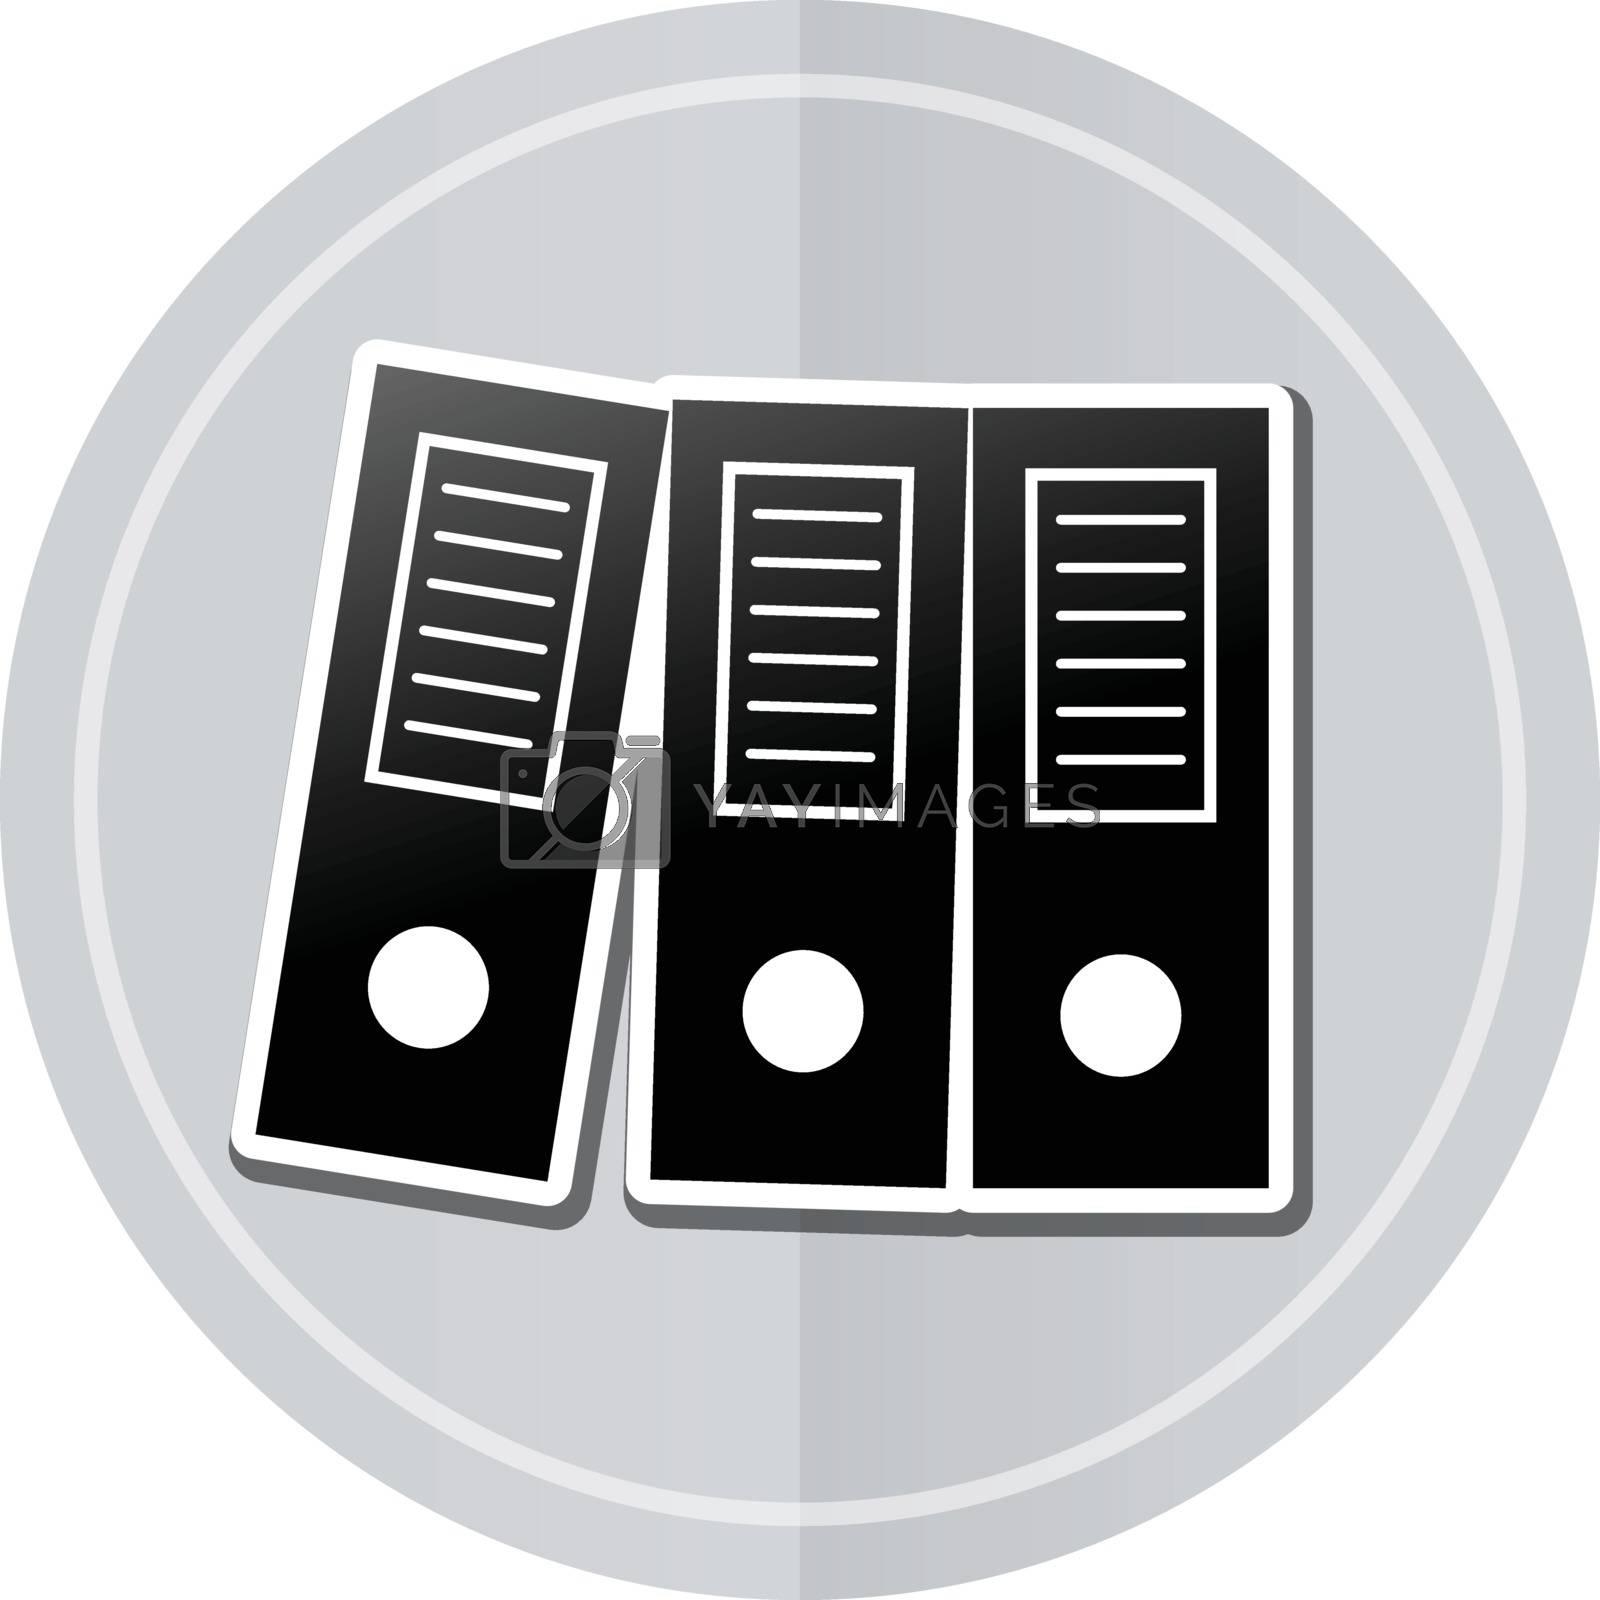 Illustration of binders sticker icon simple design